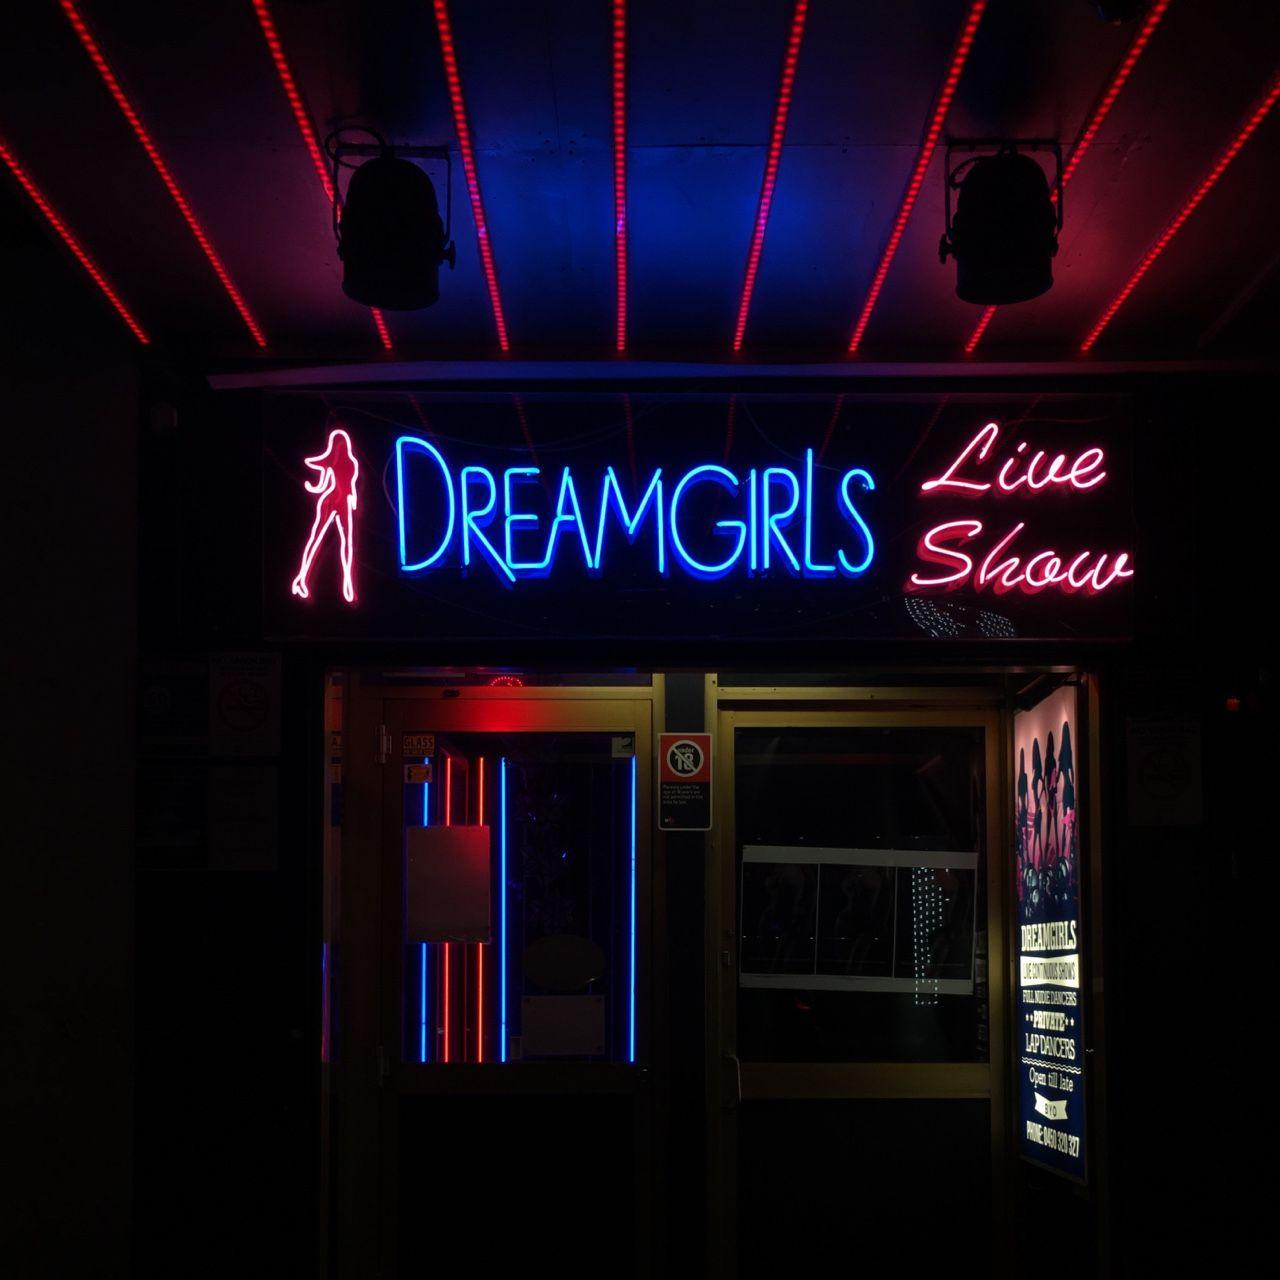 Dream girls. Kings Cross iconic neon. Still lit up. Neon